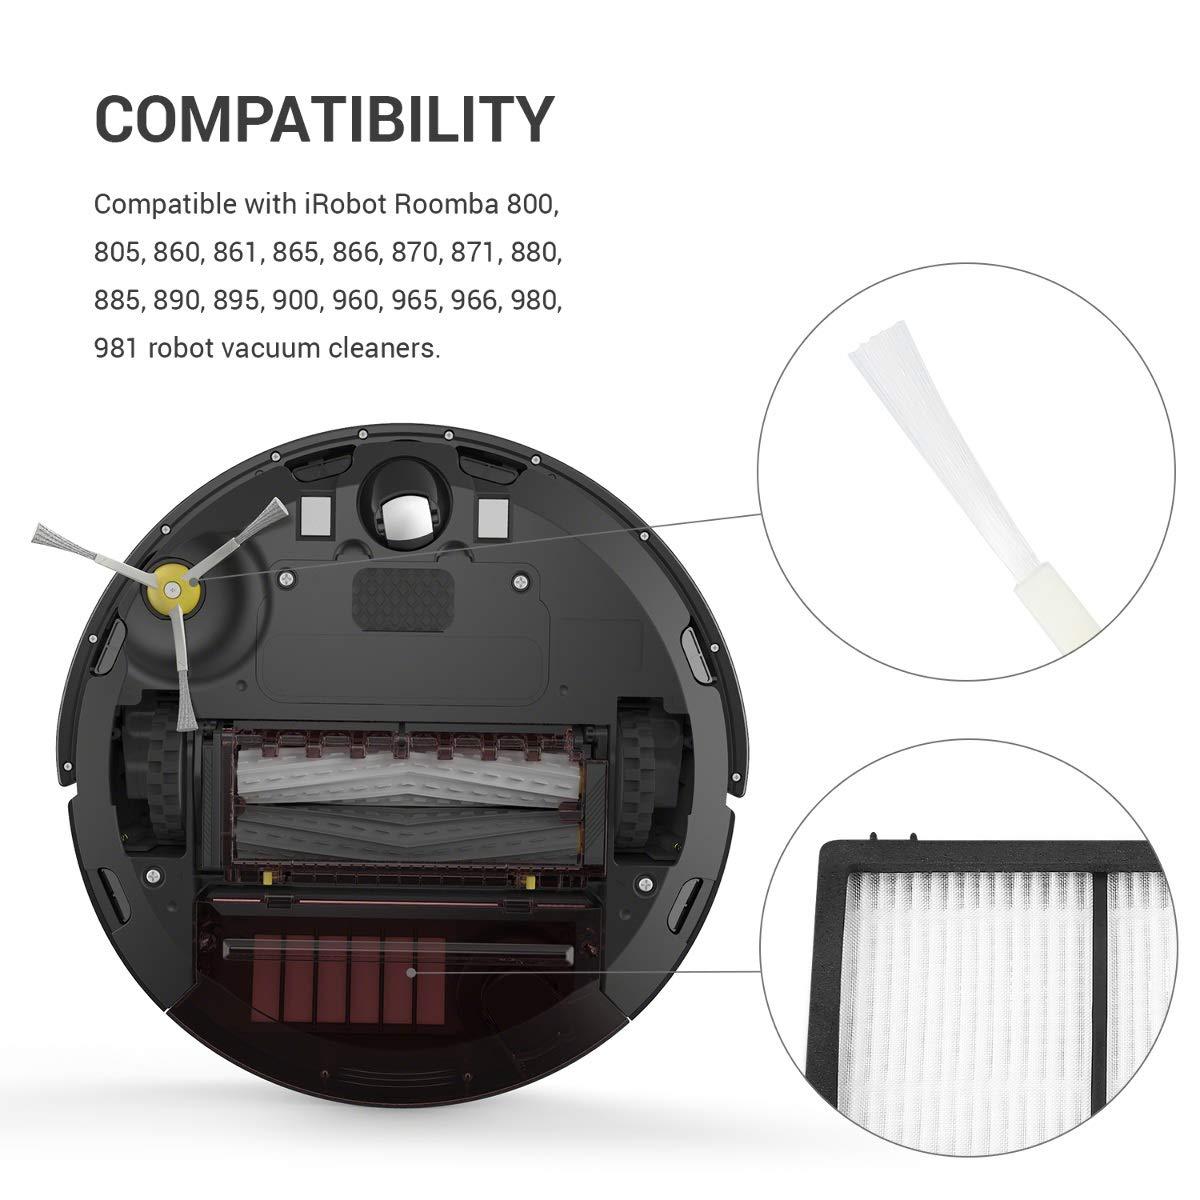 Serie 800//900 Accesorios y recambios de escobilla Lateral para Robot Aspirador Roomba kwmobile Set de 3 cepillos Laterales de Repuesto para Roomba